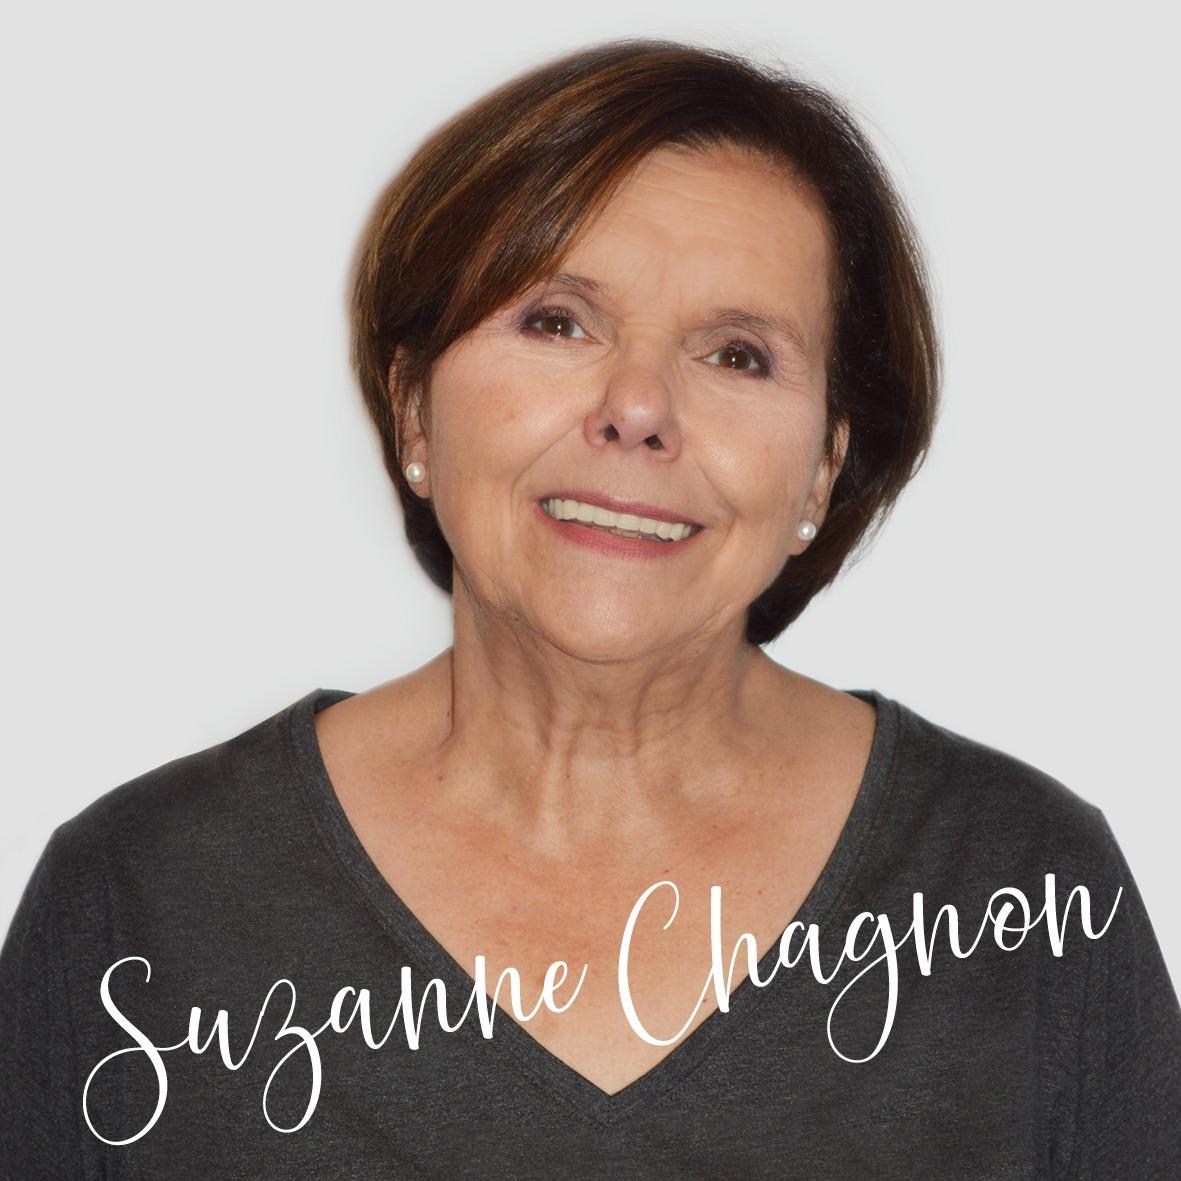 Suzanne Chagnon de Manu Factum